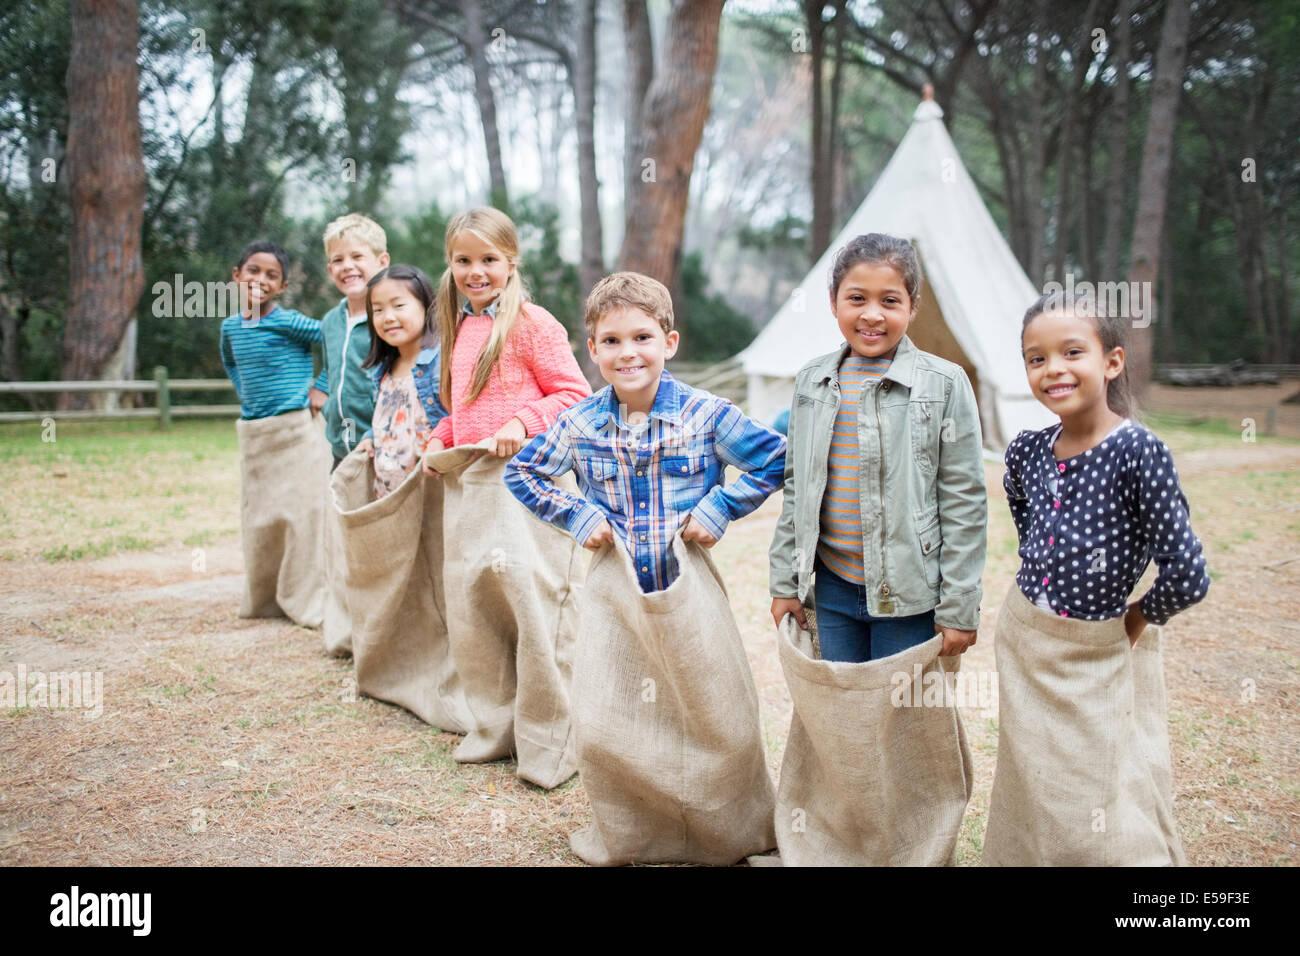 Children smiling at start of sack race - Stock Image